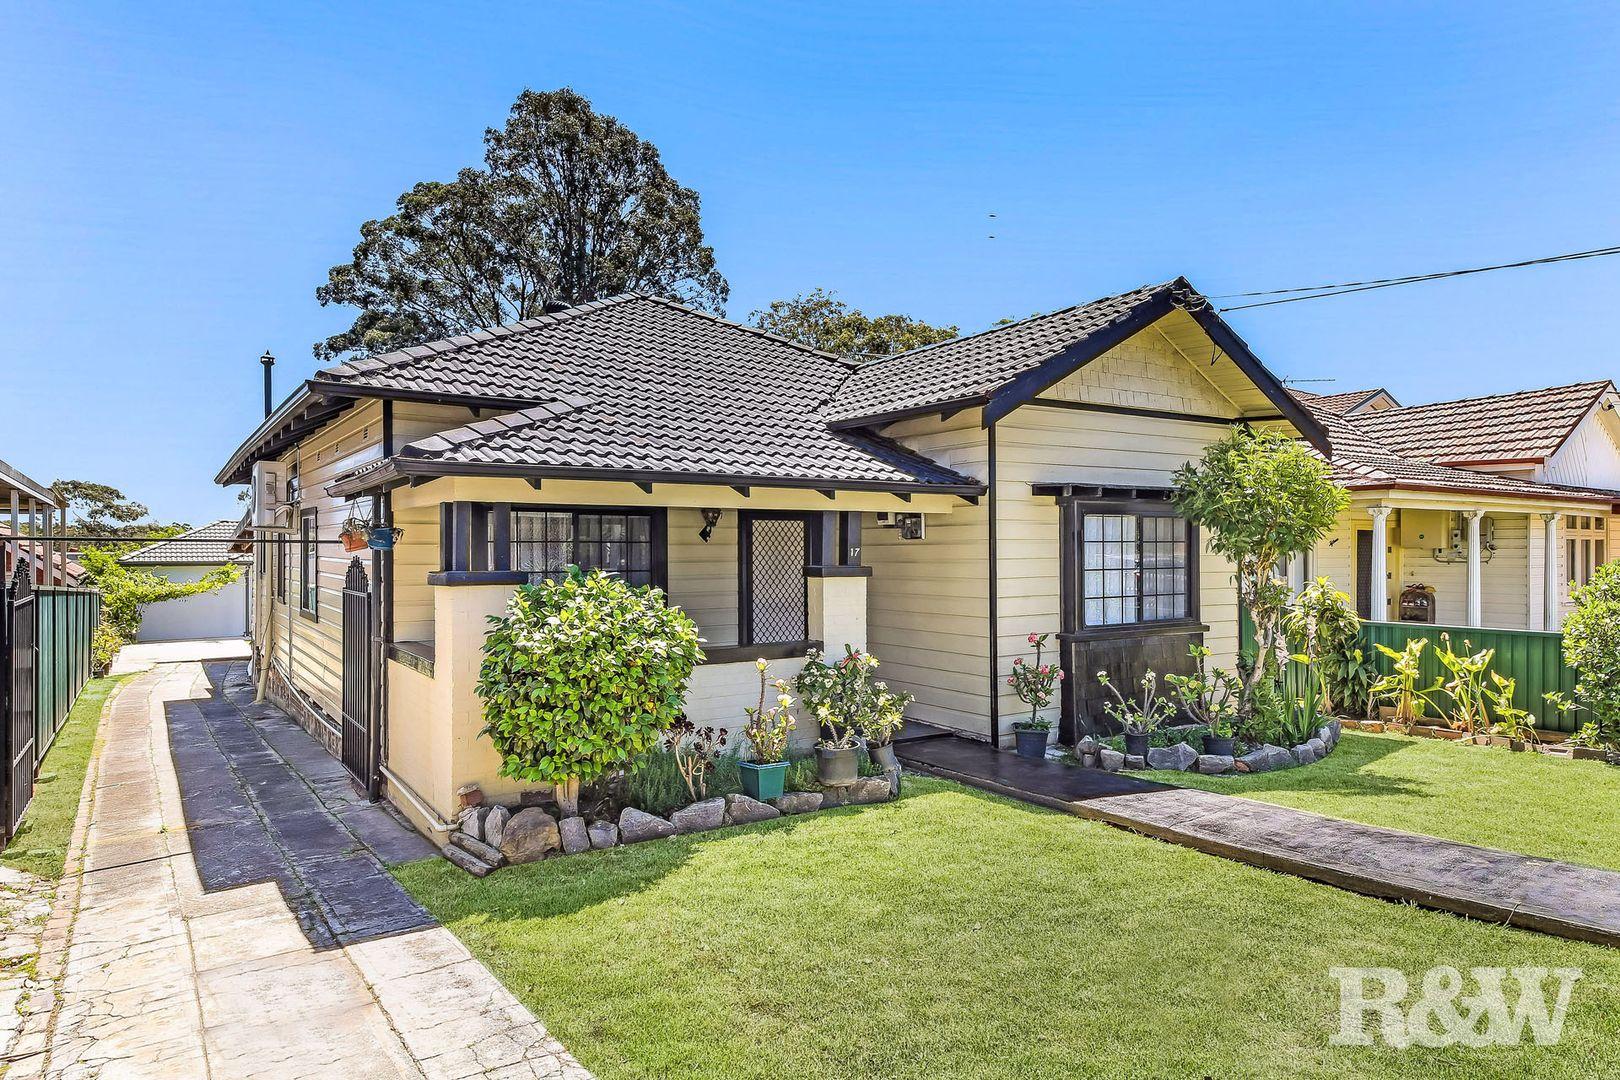 17 Beaumont Street, Auburn NSW 2144, Image 0